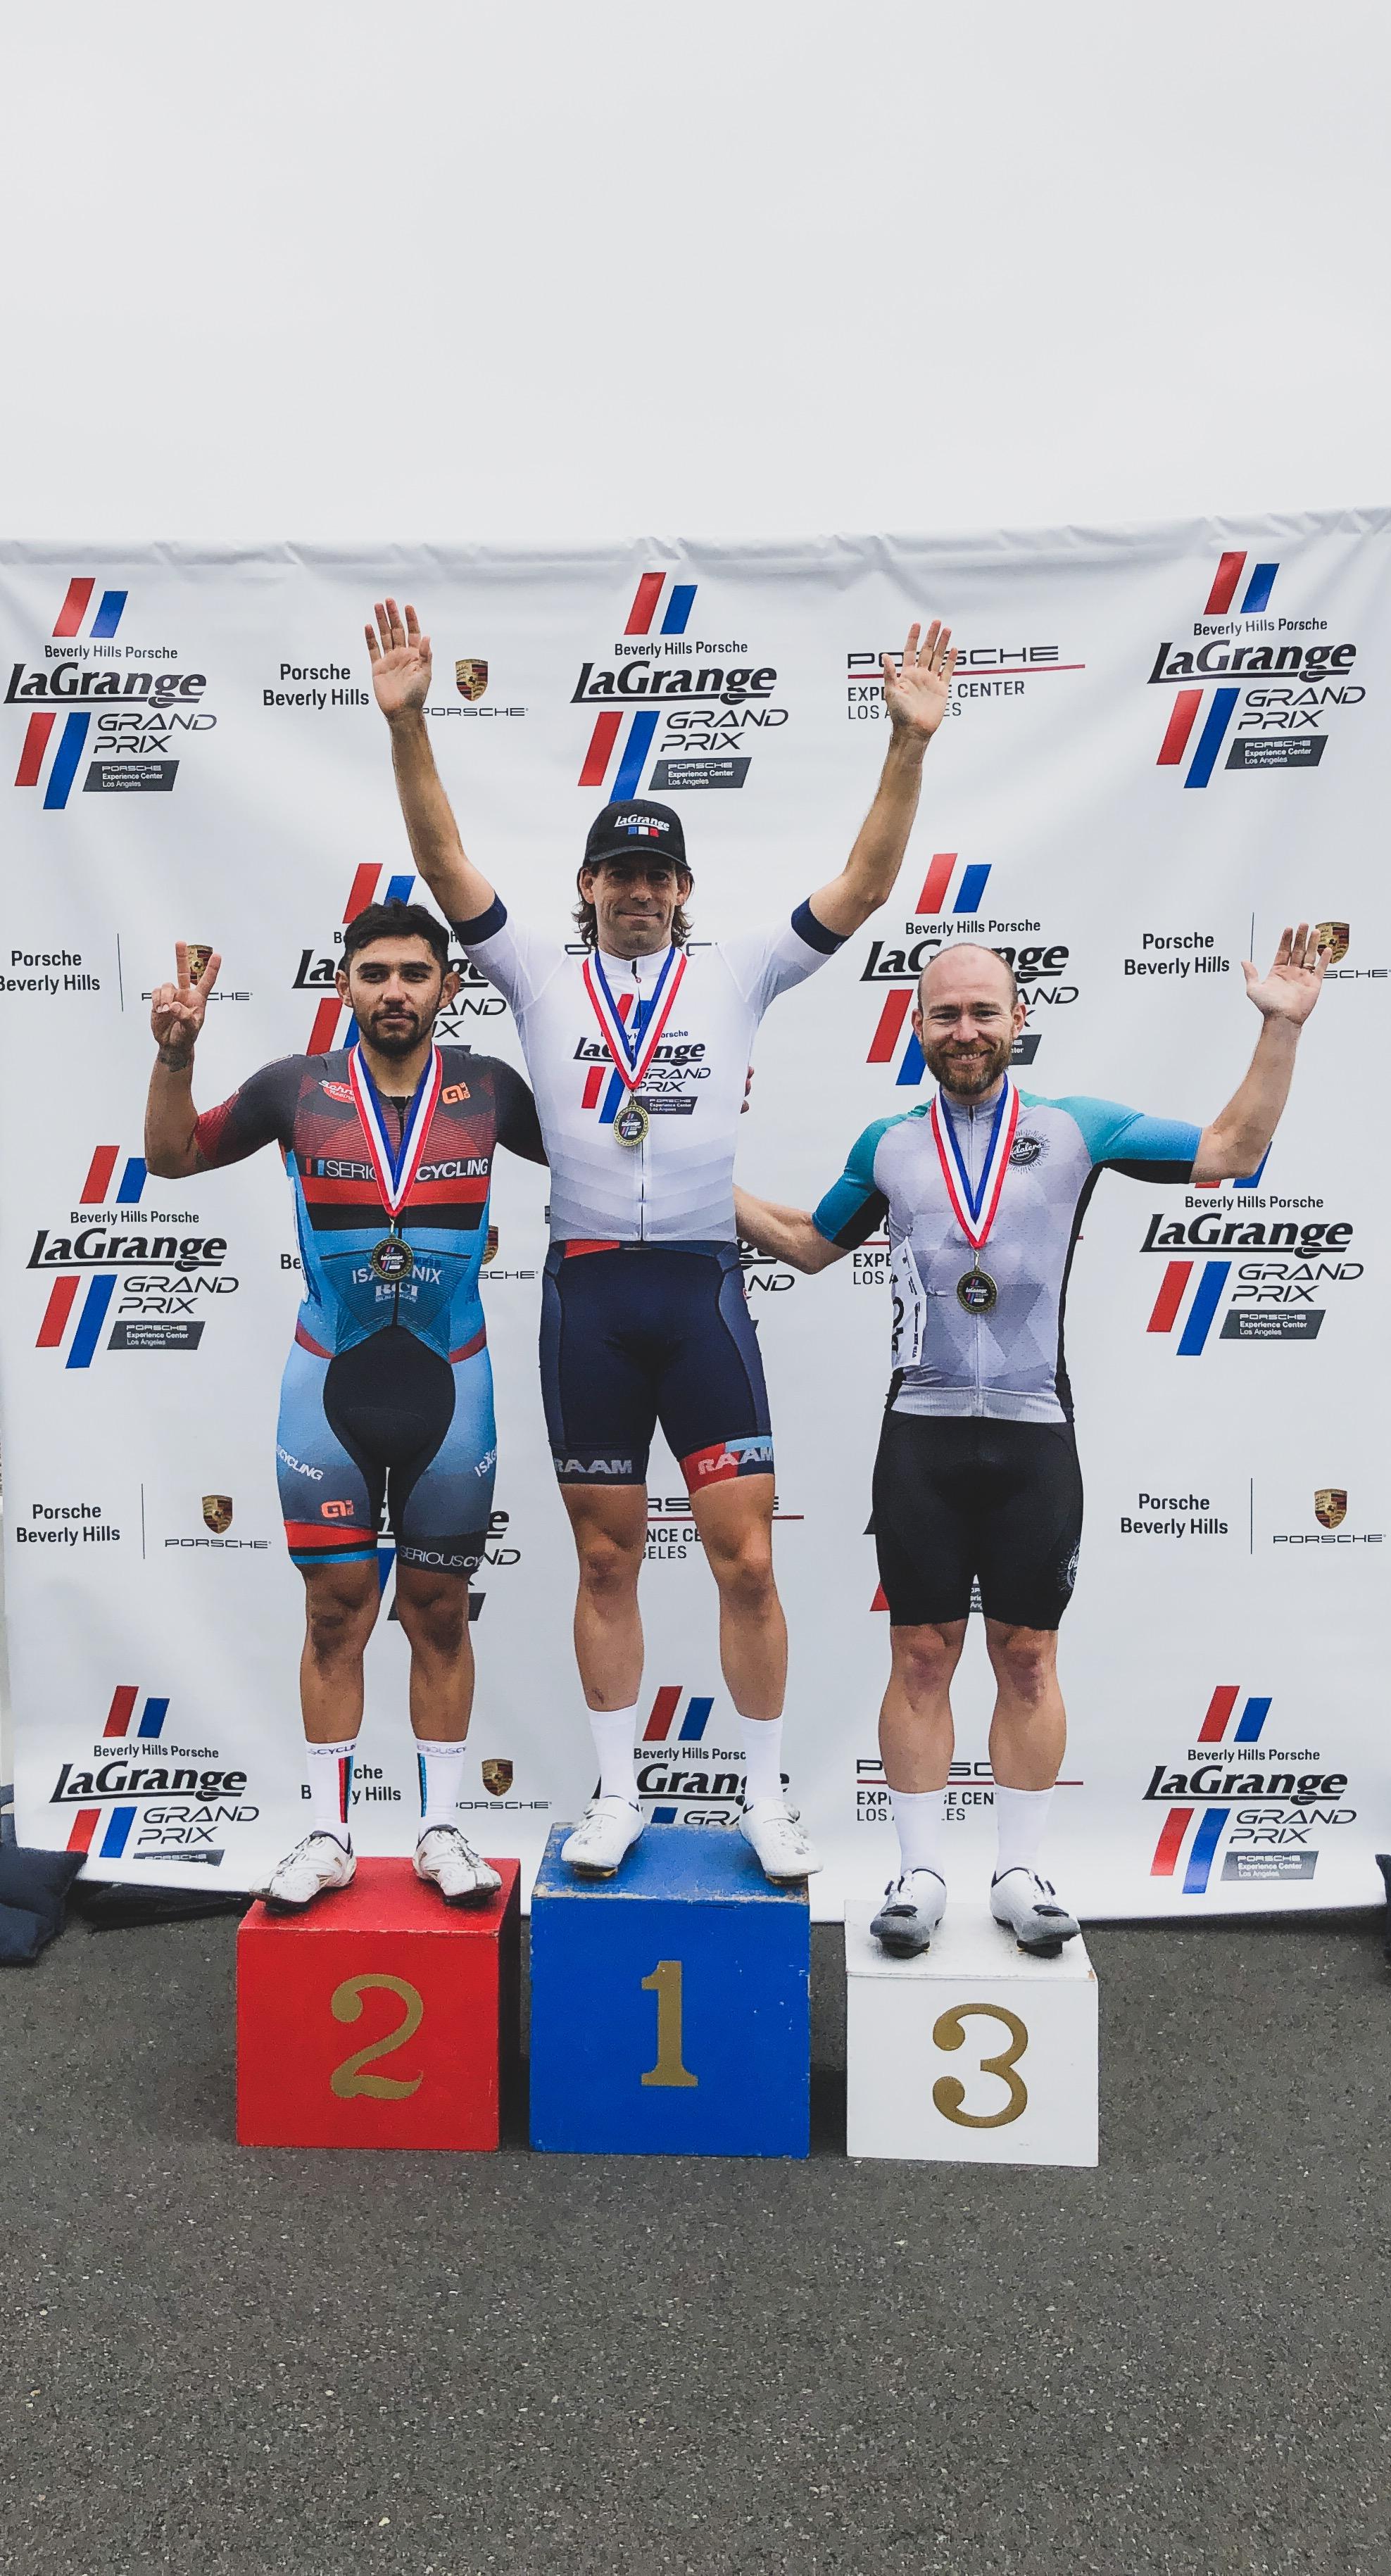 Congrats to Steven Walter winning the men's 4/5 race at LGGP